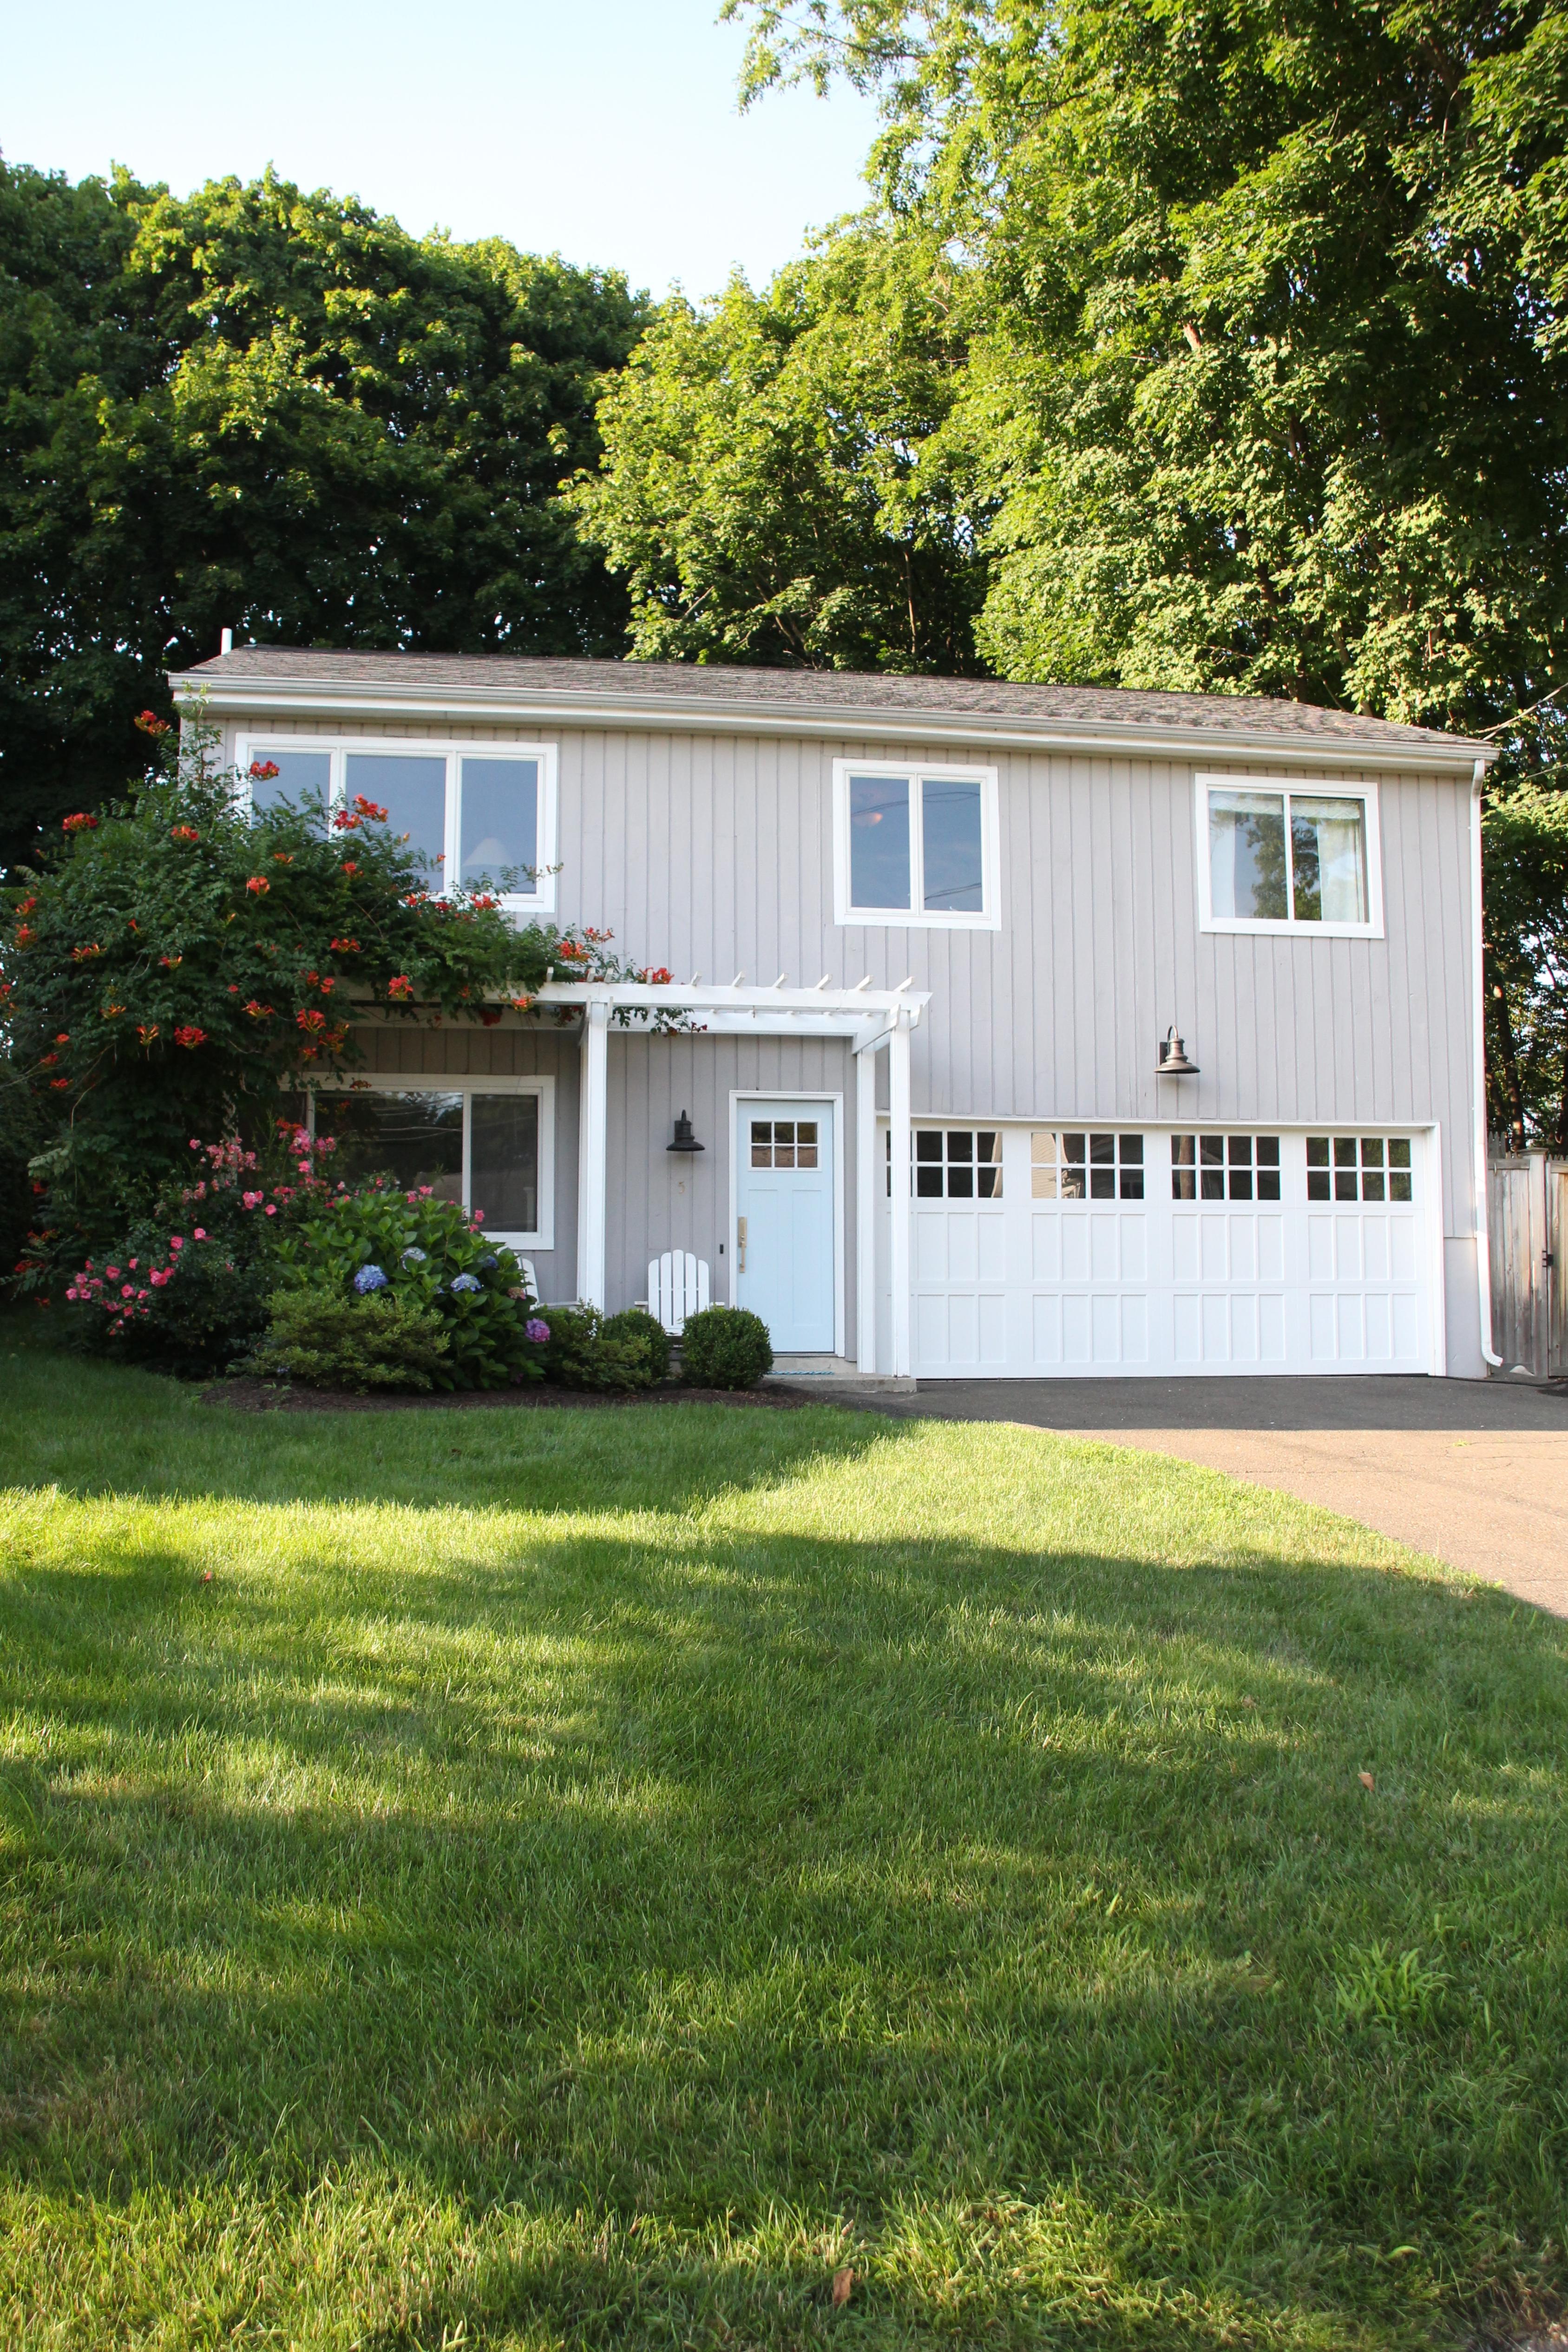 Villa per Vendita alle ore 5 Woodbine Street Norwalk, Connecticut 06853 Stati Uniti